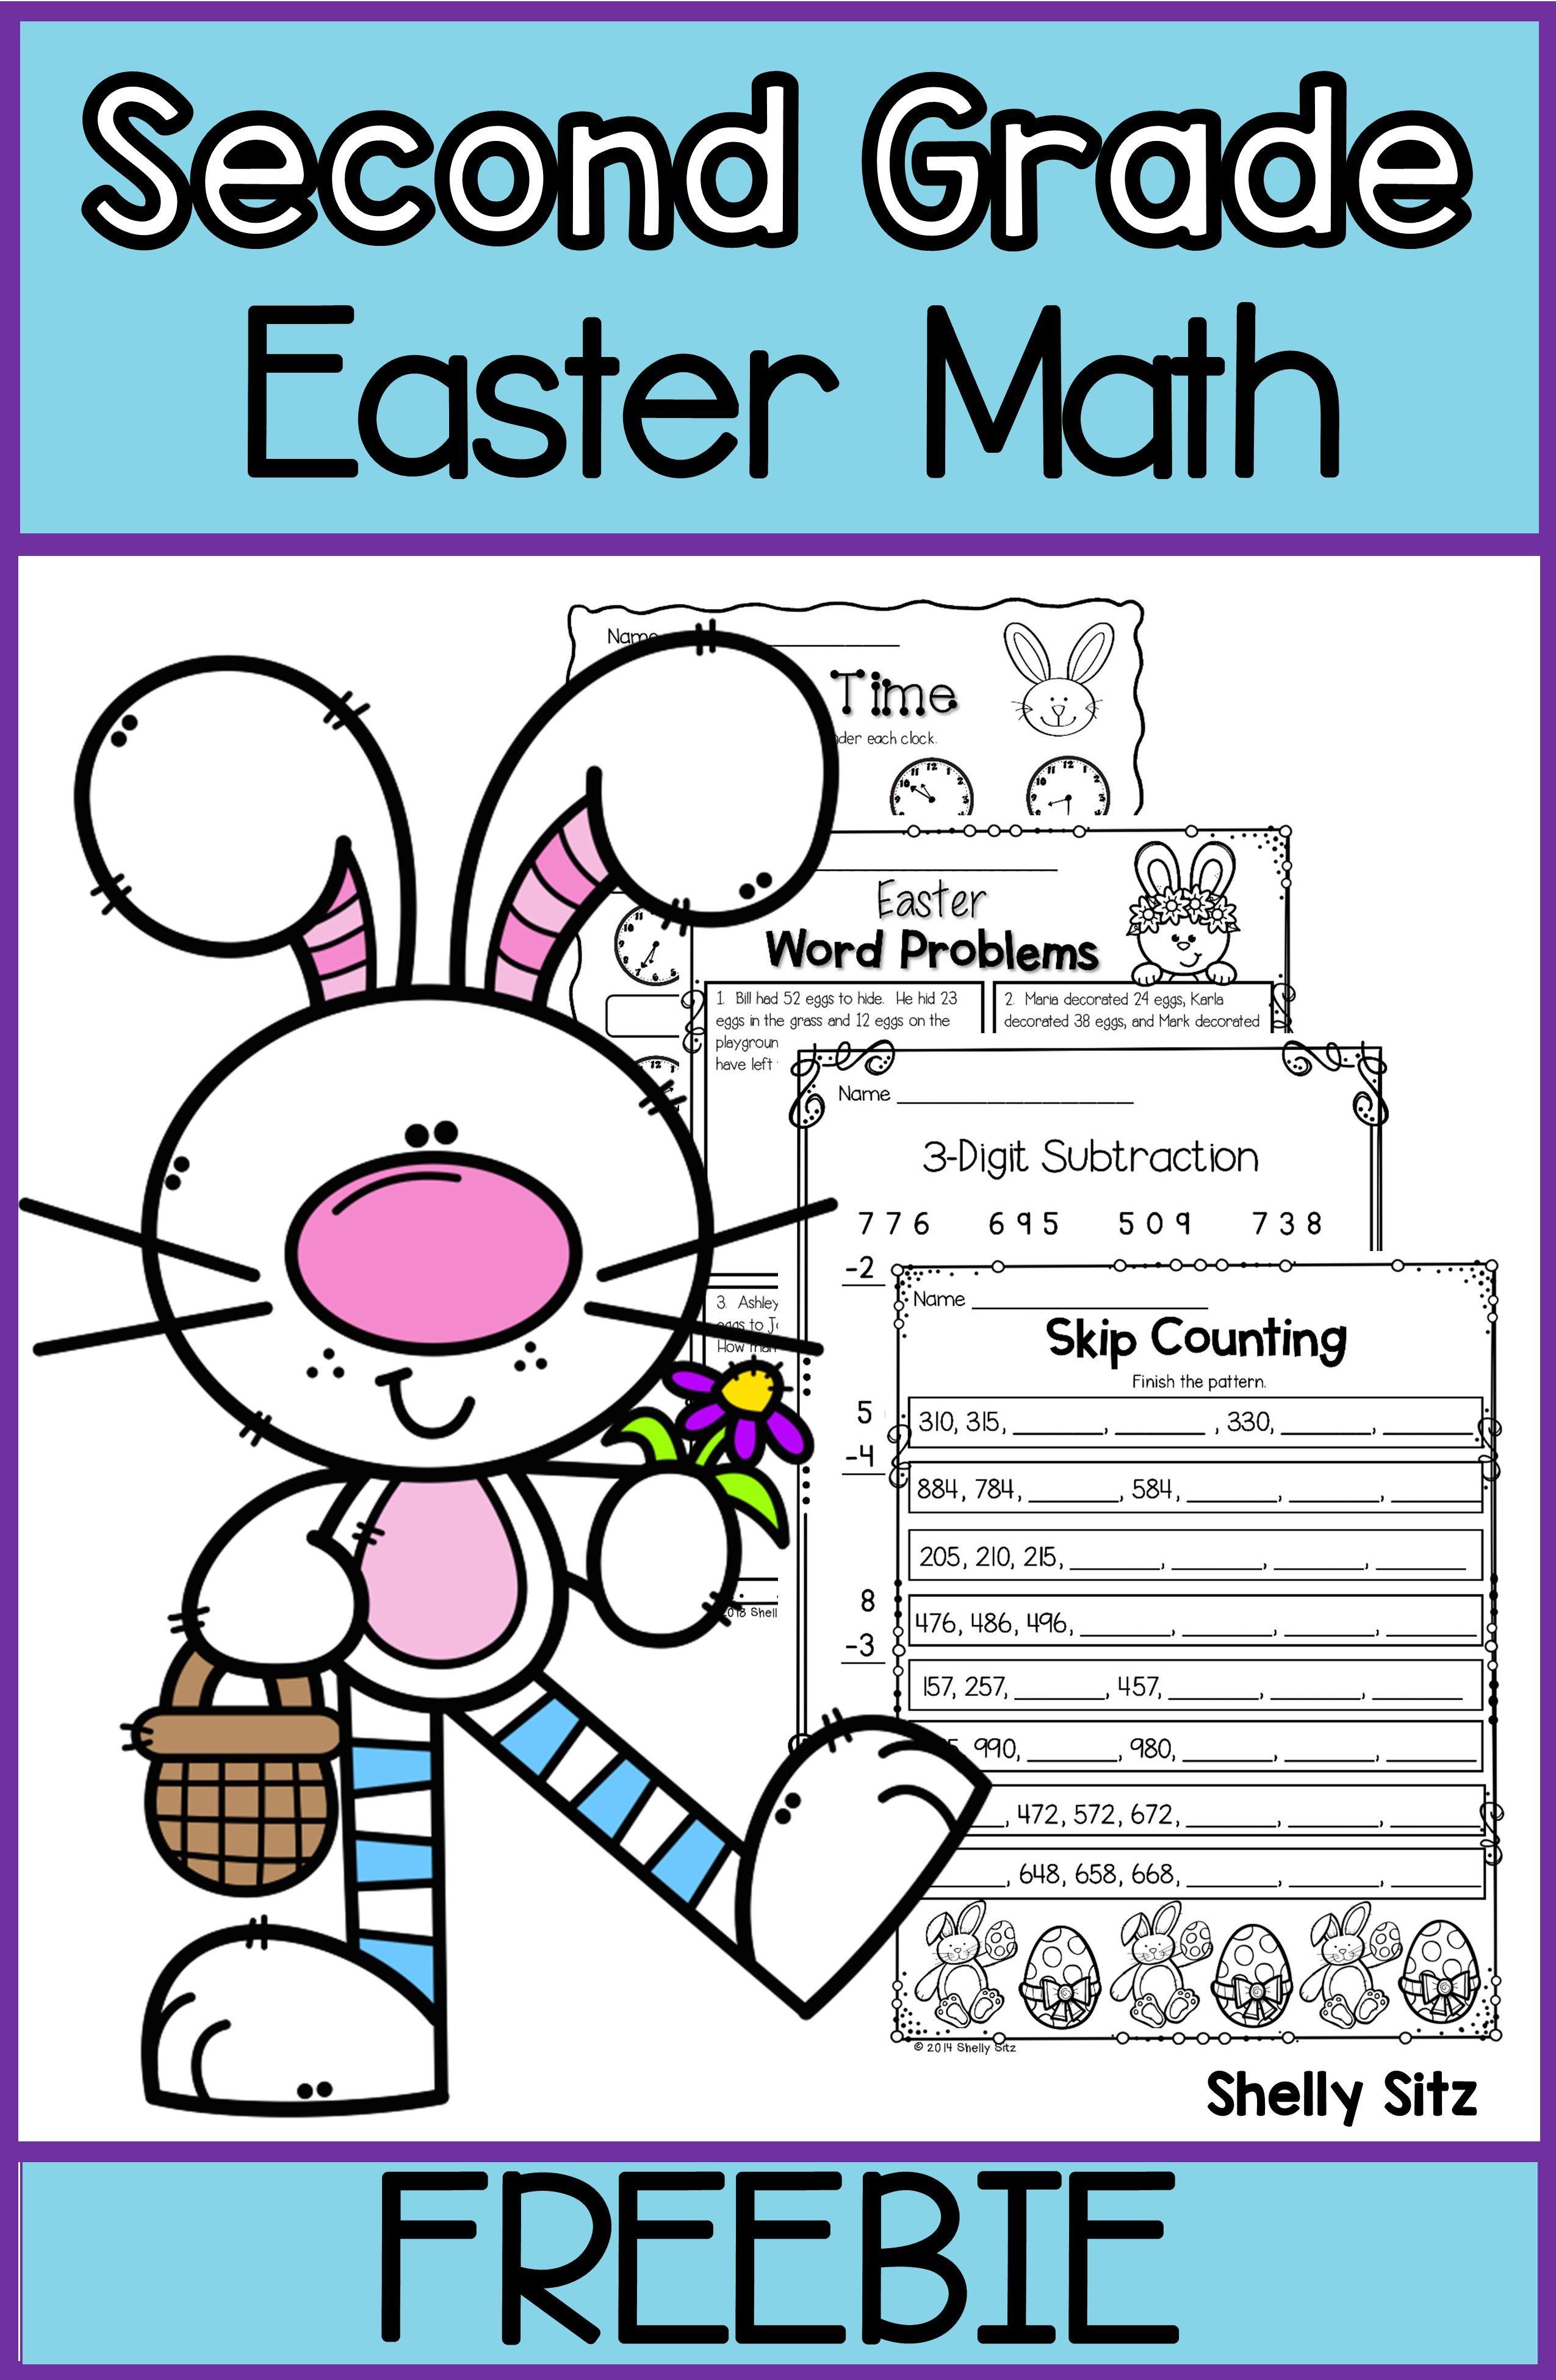 Easter Math for Second Grade   Easter math [ 3900 x 2550 Pixel ]